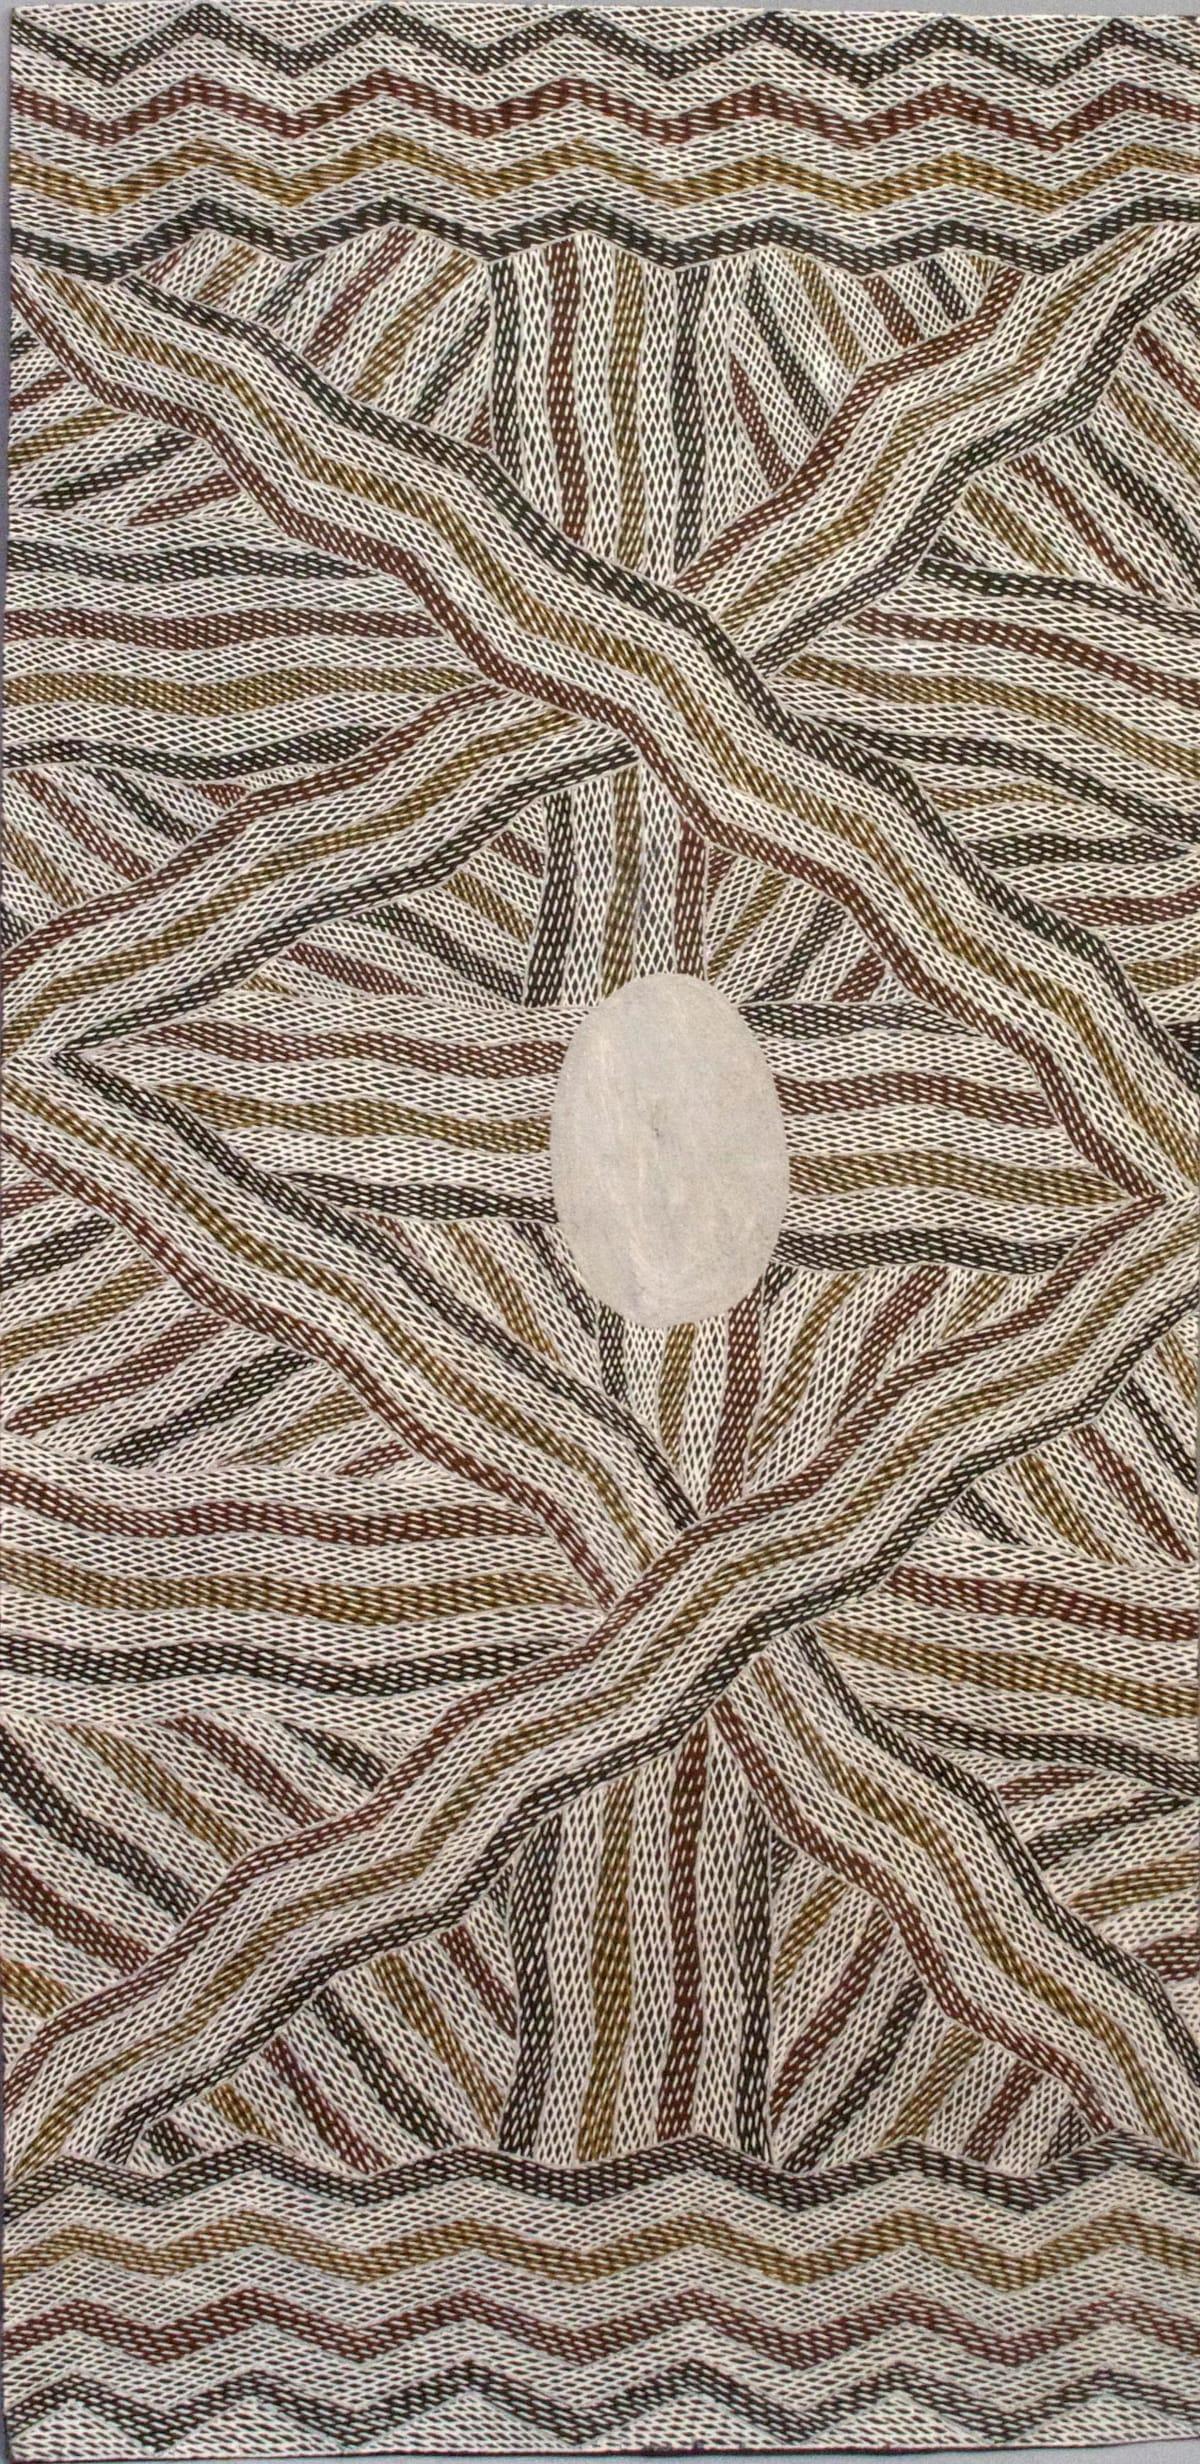 Manini Gumana Garraparra natural earth pigment on bark 116 x 53 cm